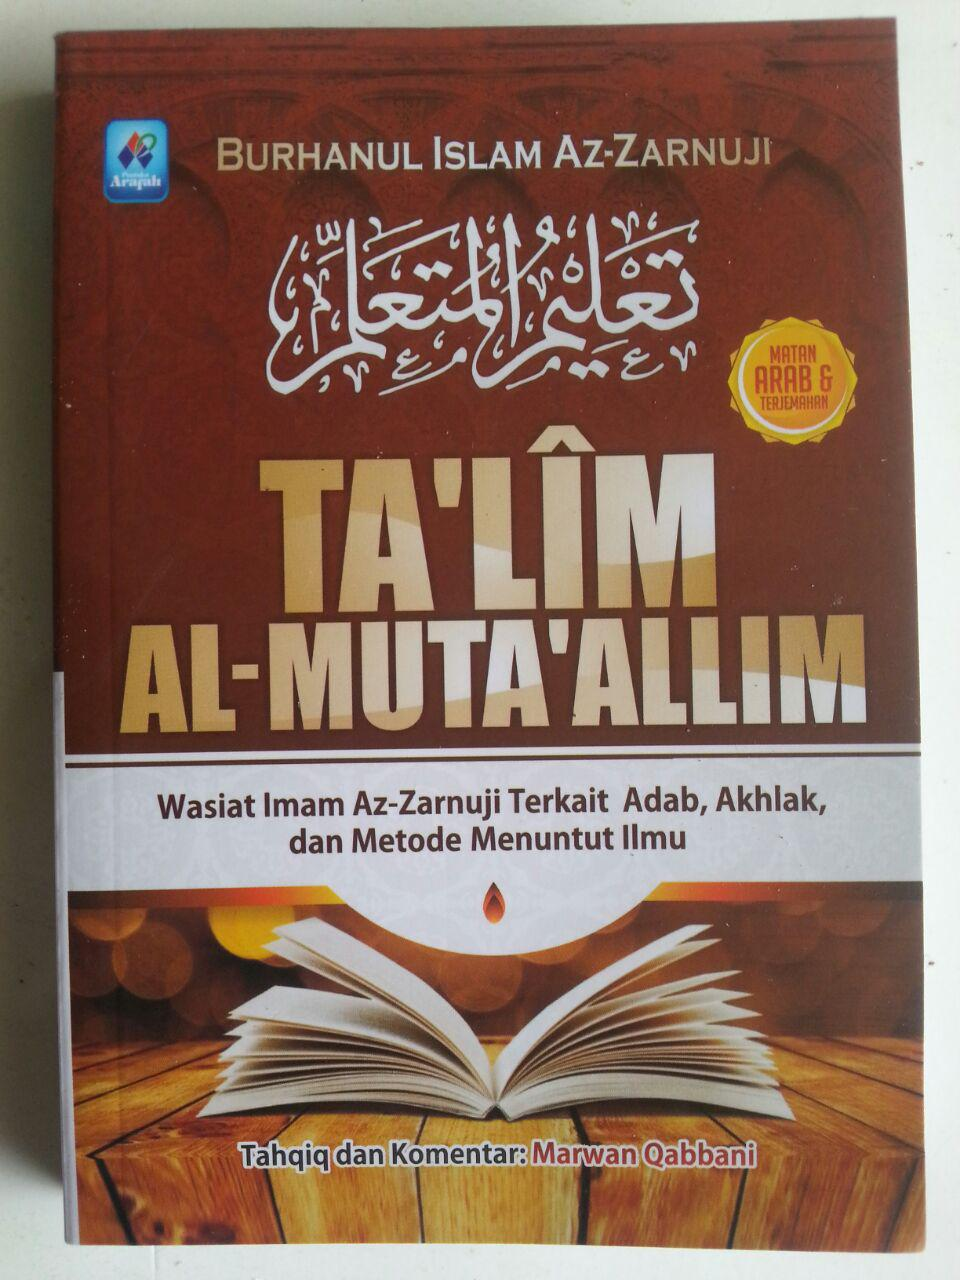 Buku Ta'lim Al-Muta'allim Wasiat Terkait Adab Akhlak Menuntut Ilmu cover 2